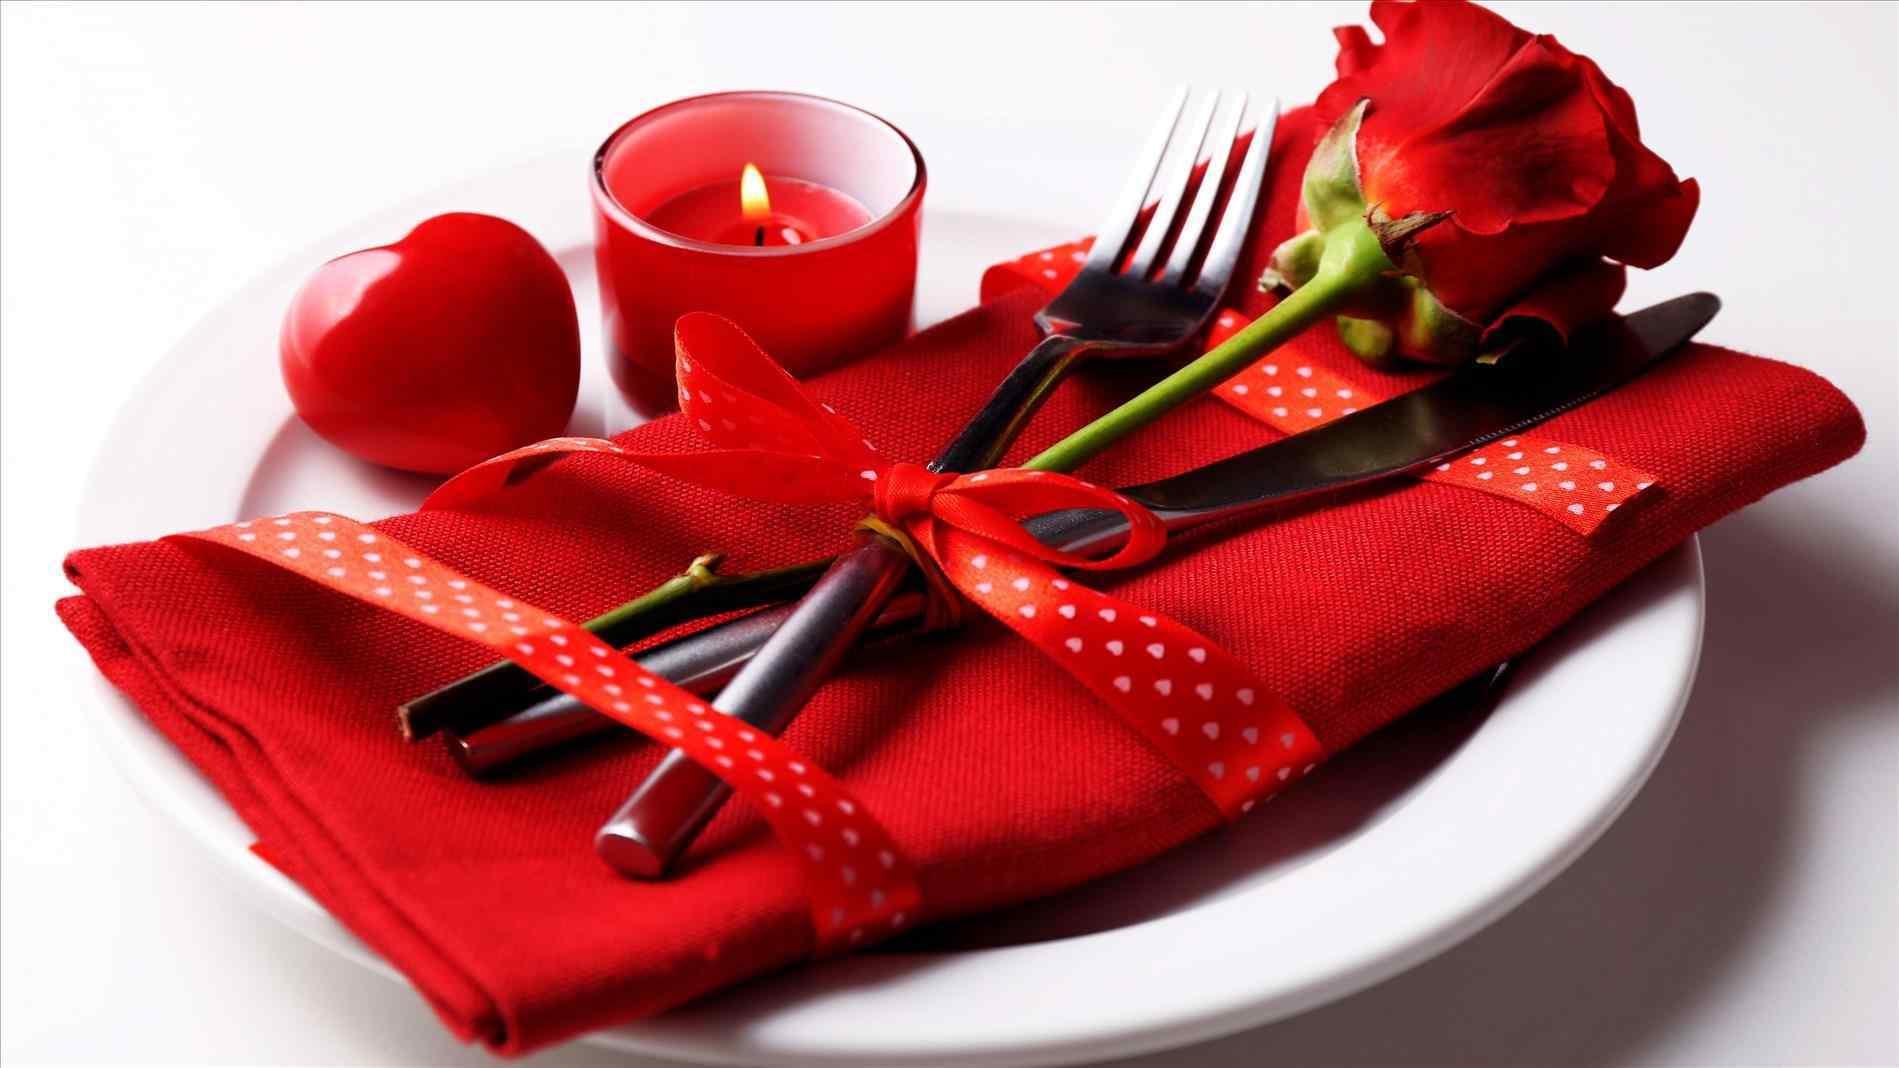 Red Heart Attractive Wallpapers Download Romantic Love Petals Beauty ...